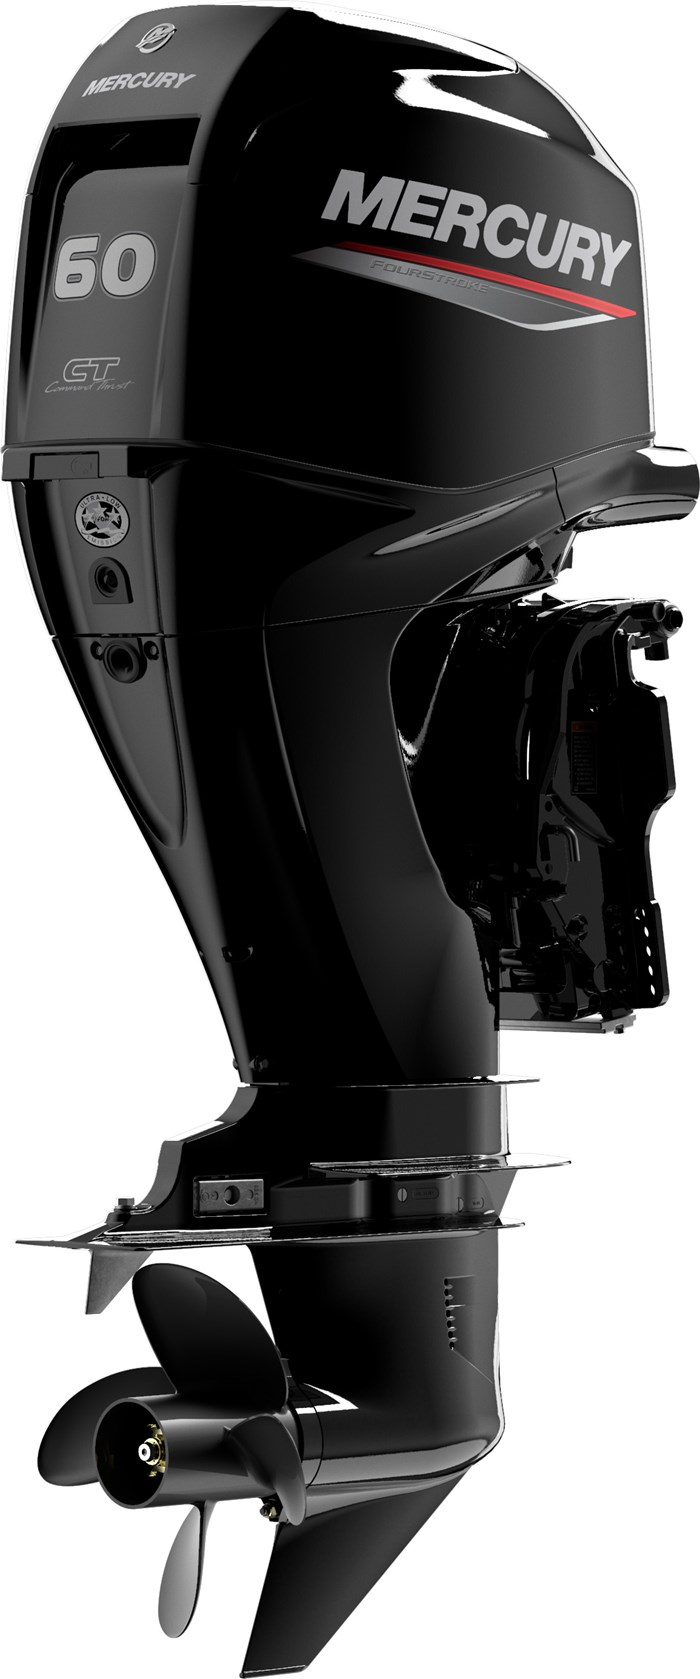 2019 Godfrey Sweetwater & Mercury 60HP Motor (Pkg) 2186 Cruise C4H (Handicap) - Metallic Bronze Photo 11 of 11